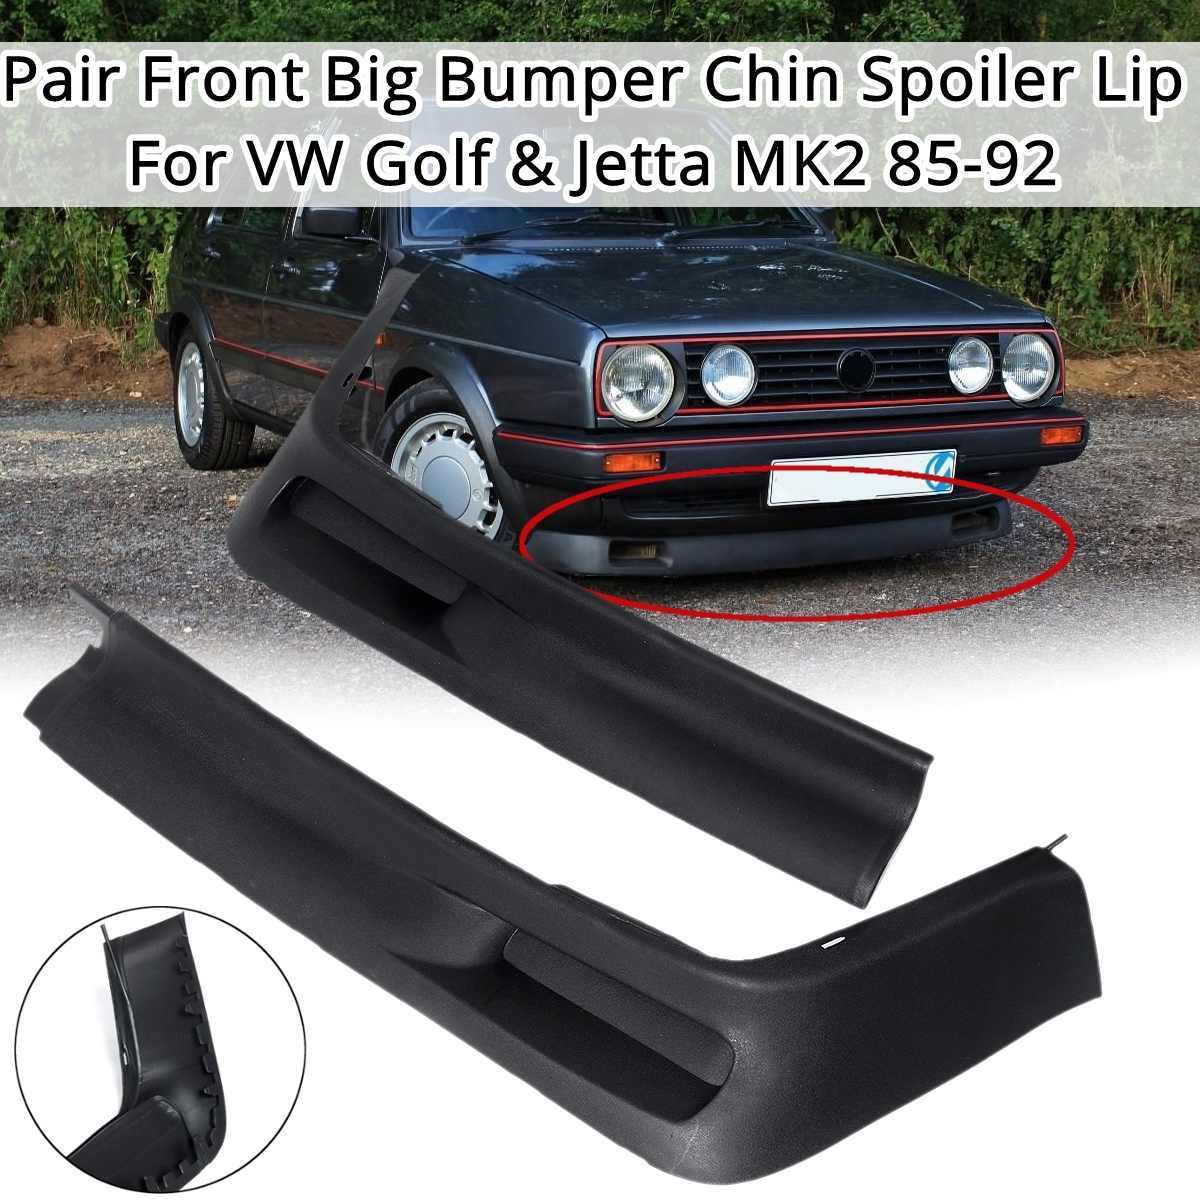 191 853 917 For Vw Golf 2 Mk2 Jetta Gti Big Bumper Side Skirt Jack Flap Front Rear Left Right 90 Spec Points Cover Models Cills Valves Parts Aliexpress